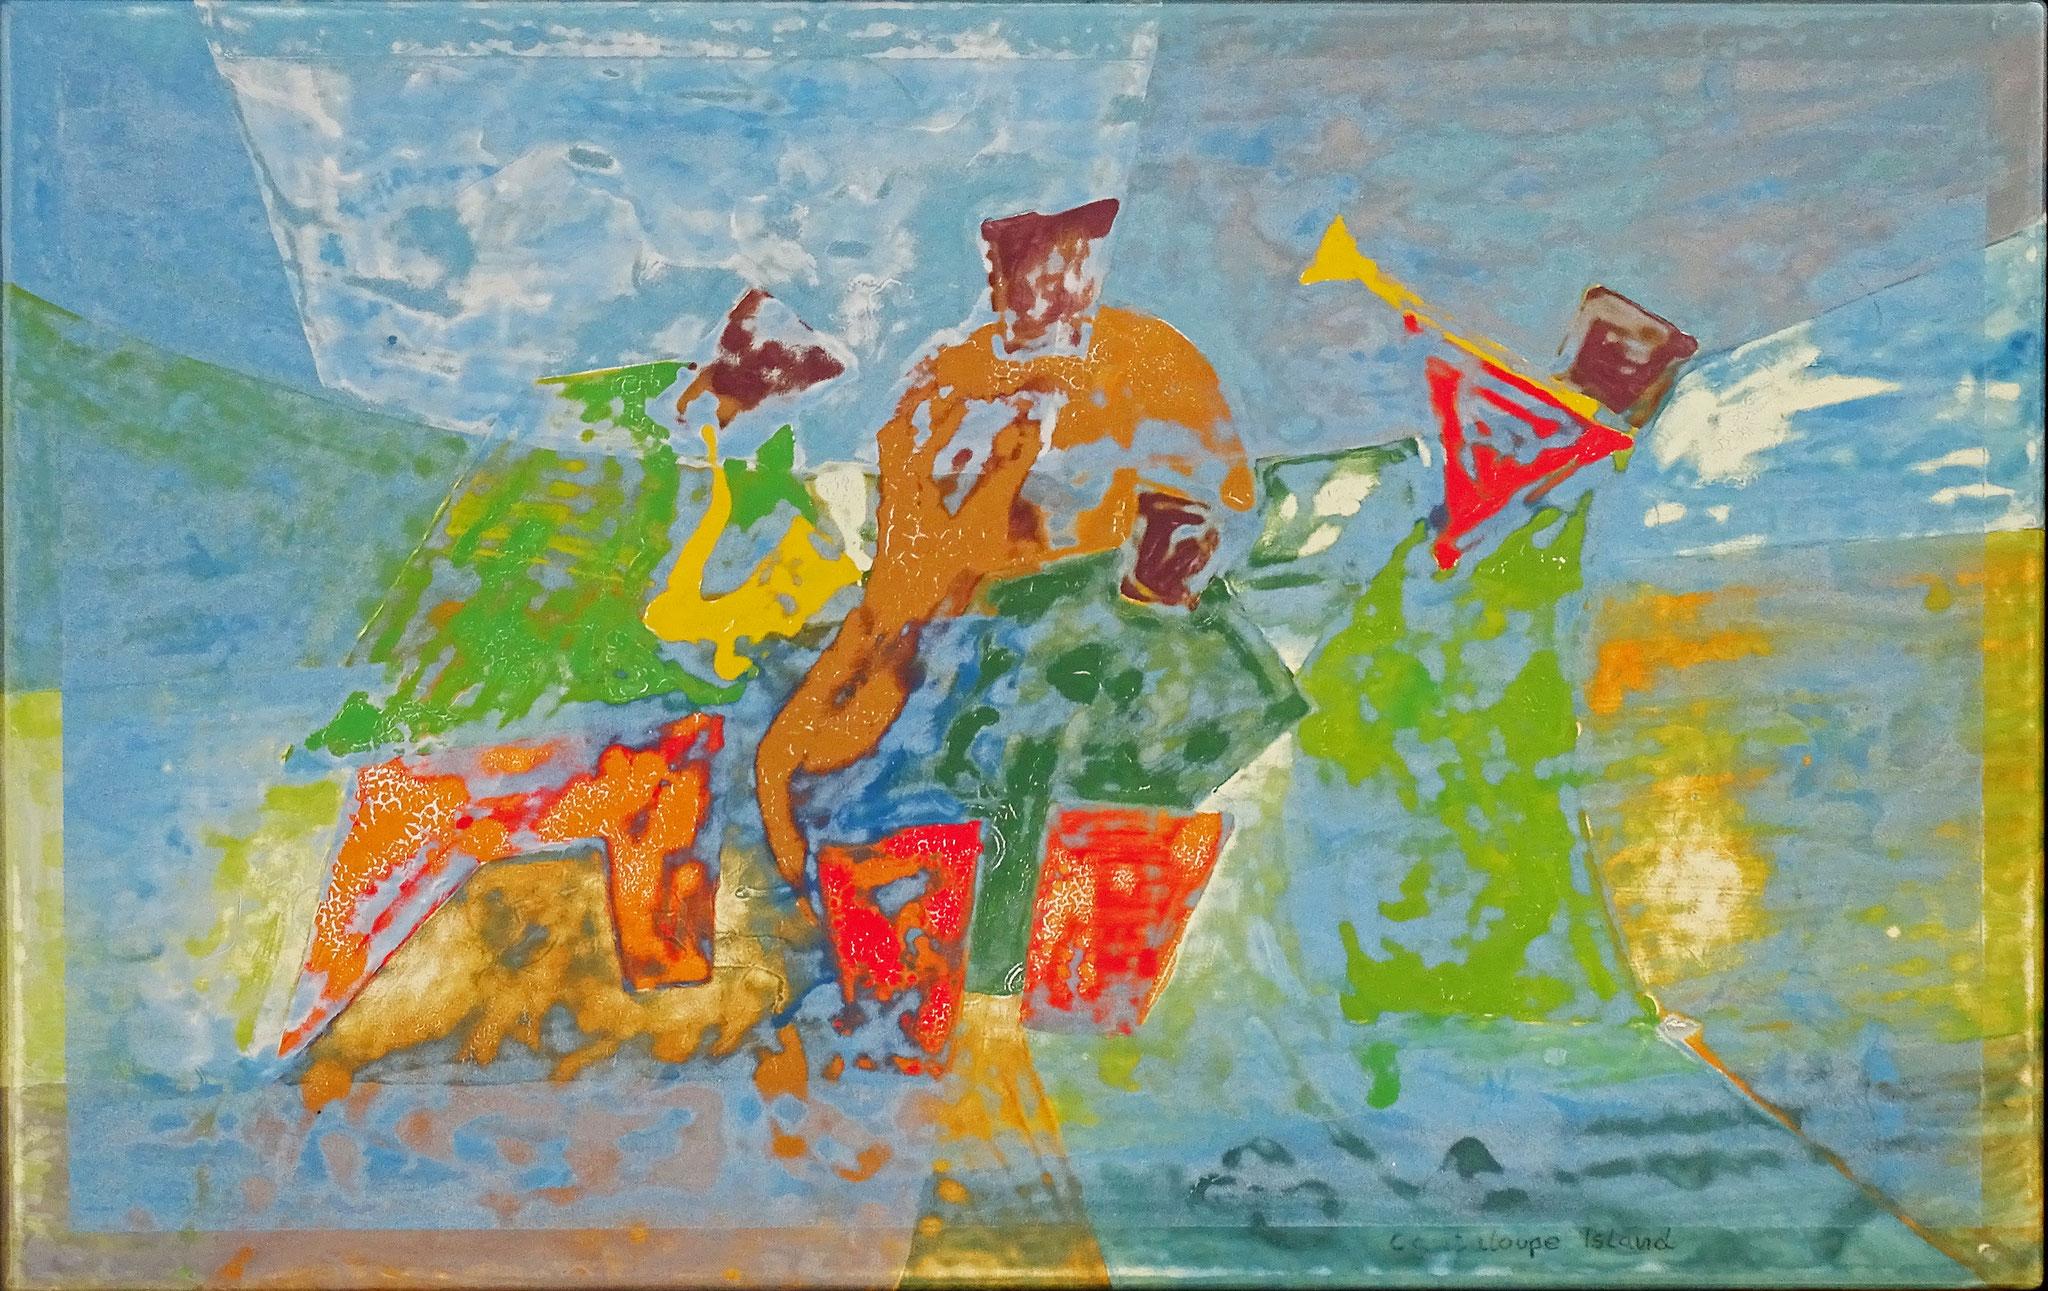 """Cantaloupe Island"" 2016, 60 x 40 cm, opakes und transp.Email,geschliffen"